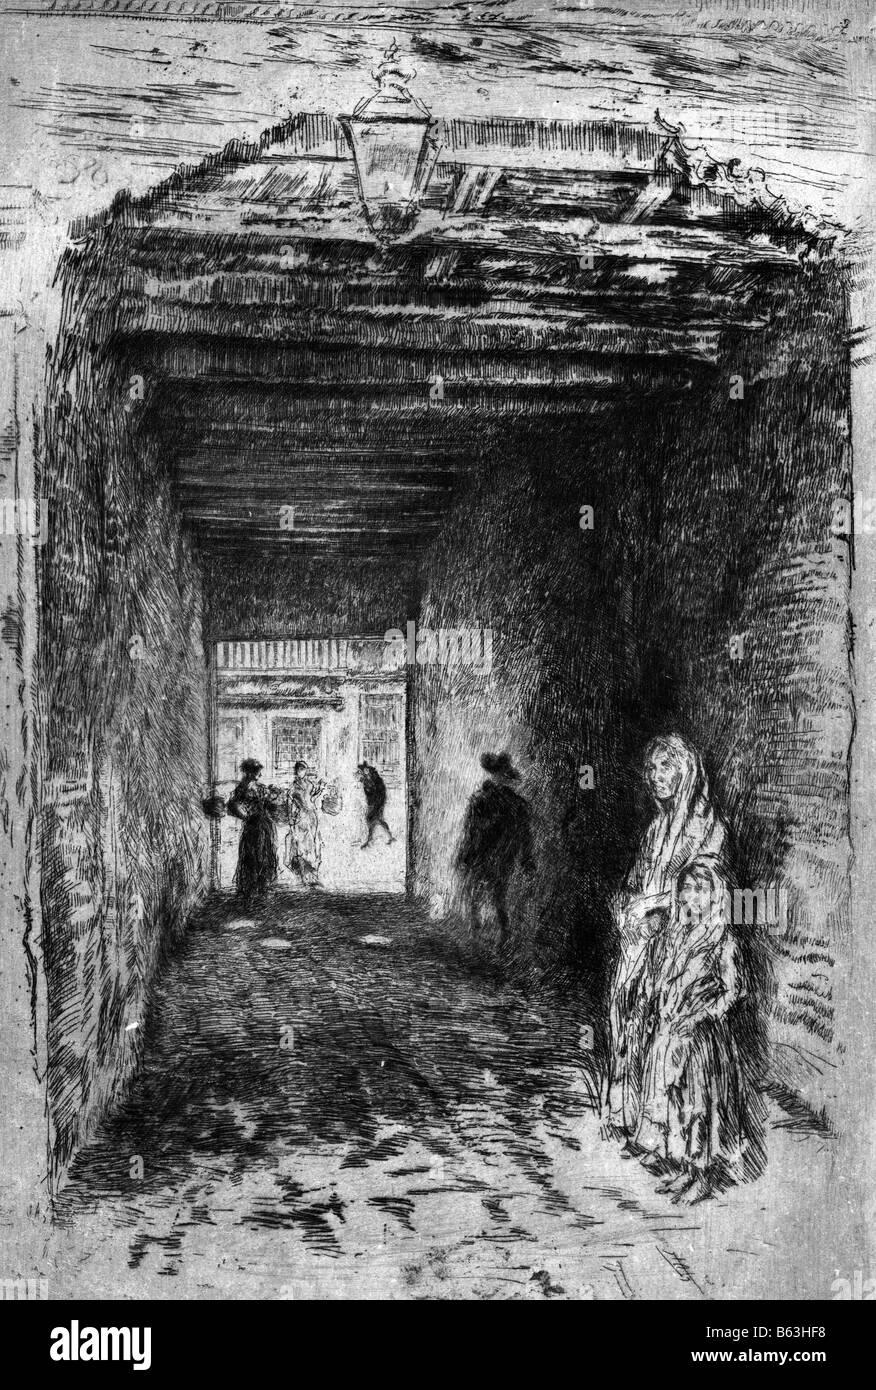 The Beggars - James Whistler - Stock Image